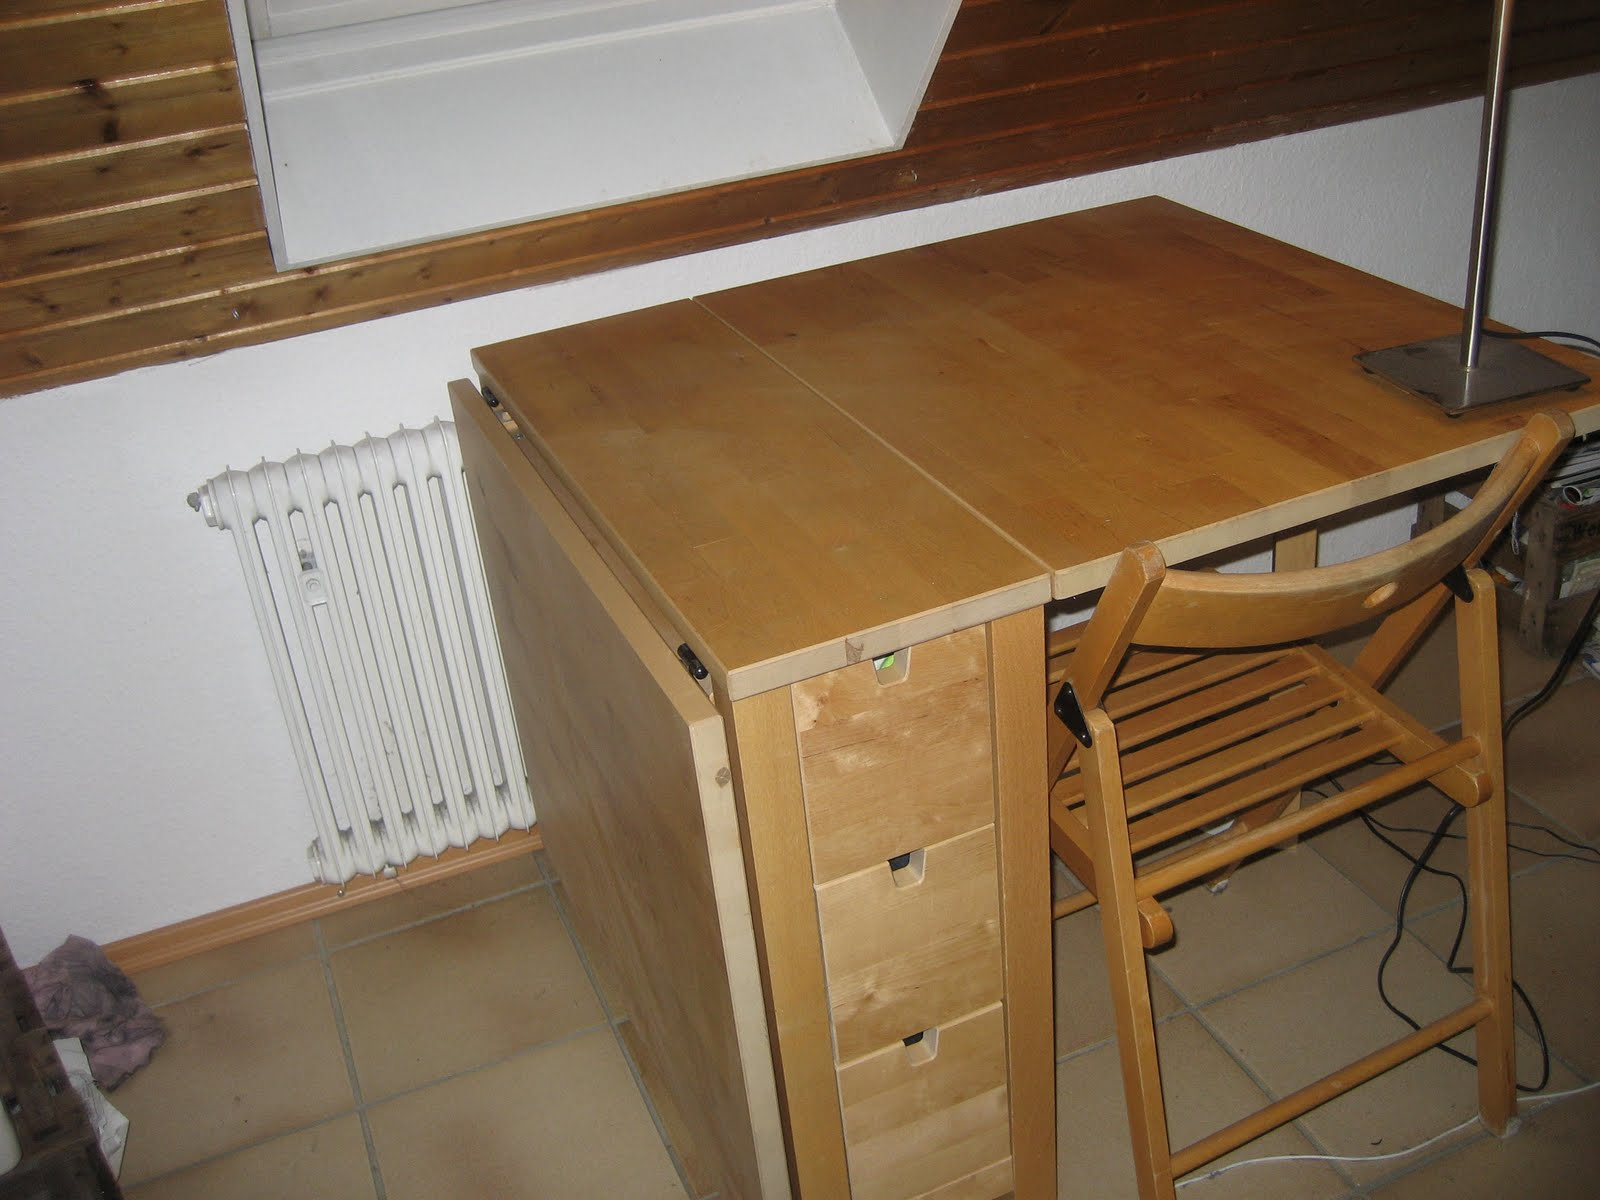 Folding Table Ikea NordenIkea Extendable Kitchen Table  : IMG6619 from algarveglobal.com size 1600 x 1200 jpeg 159kB